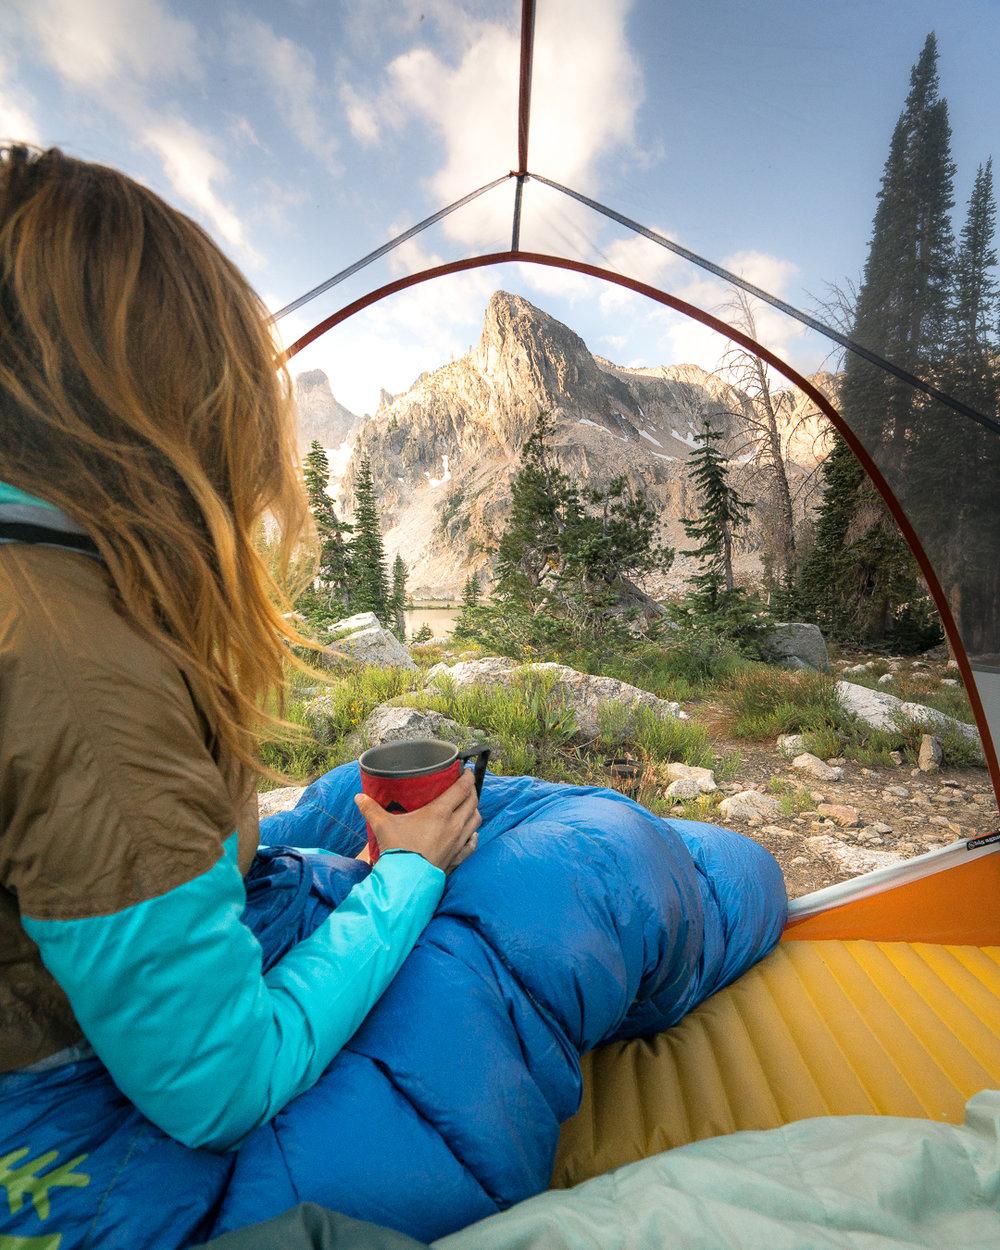 Camping Sawtooth Mountains, Idaho